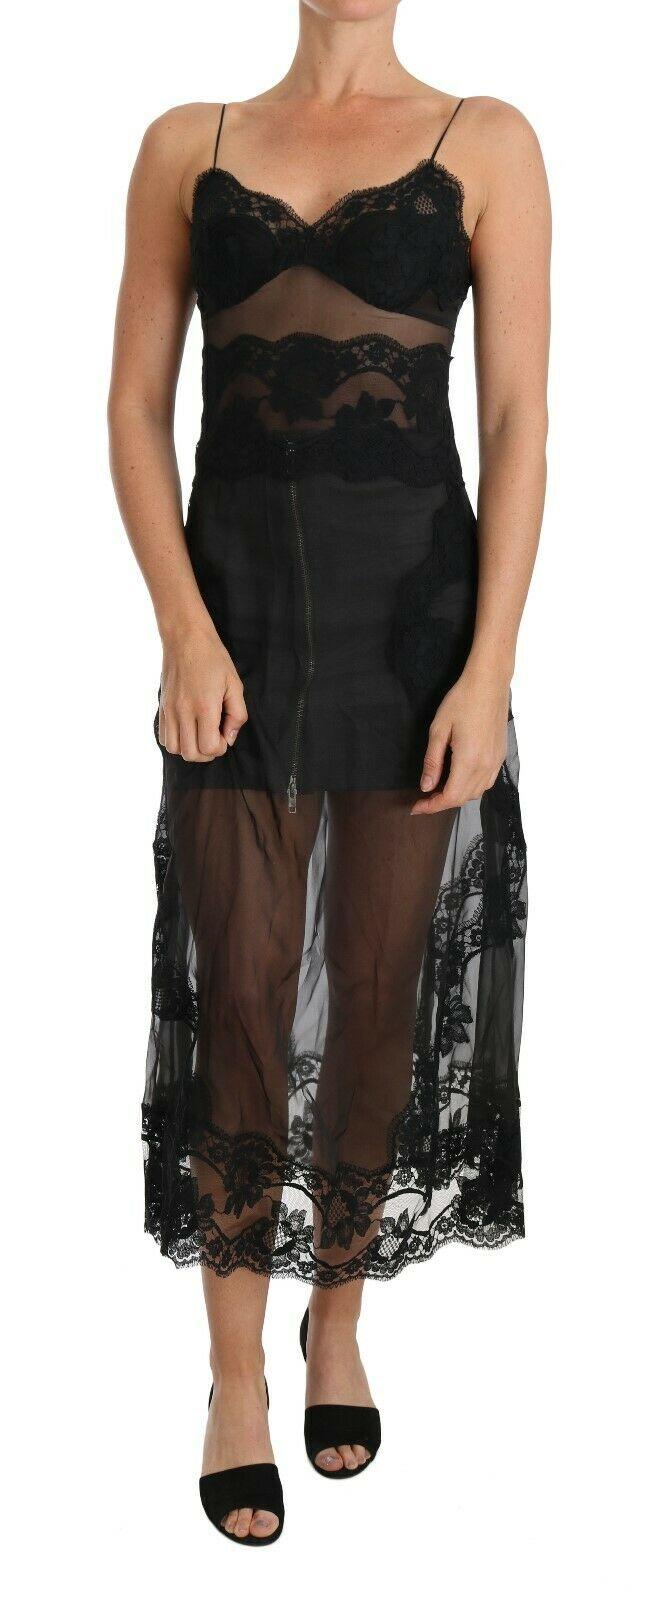 Dolce & Gabbana Women's Silk Lace Chemise Dress Black BIK100 - IT1 | XS